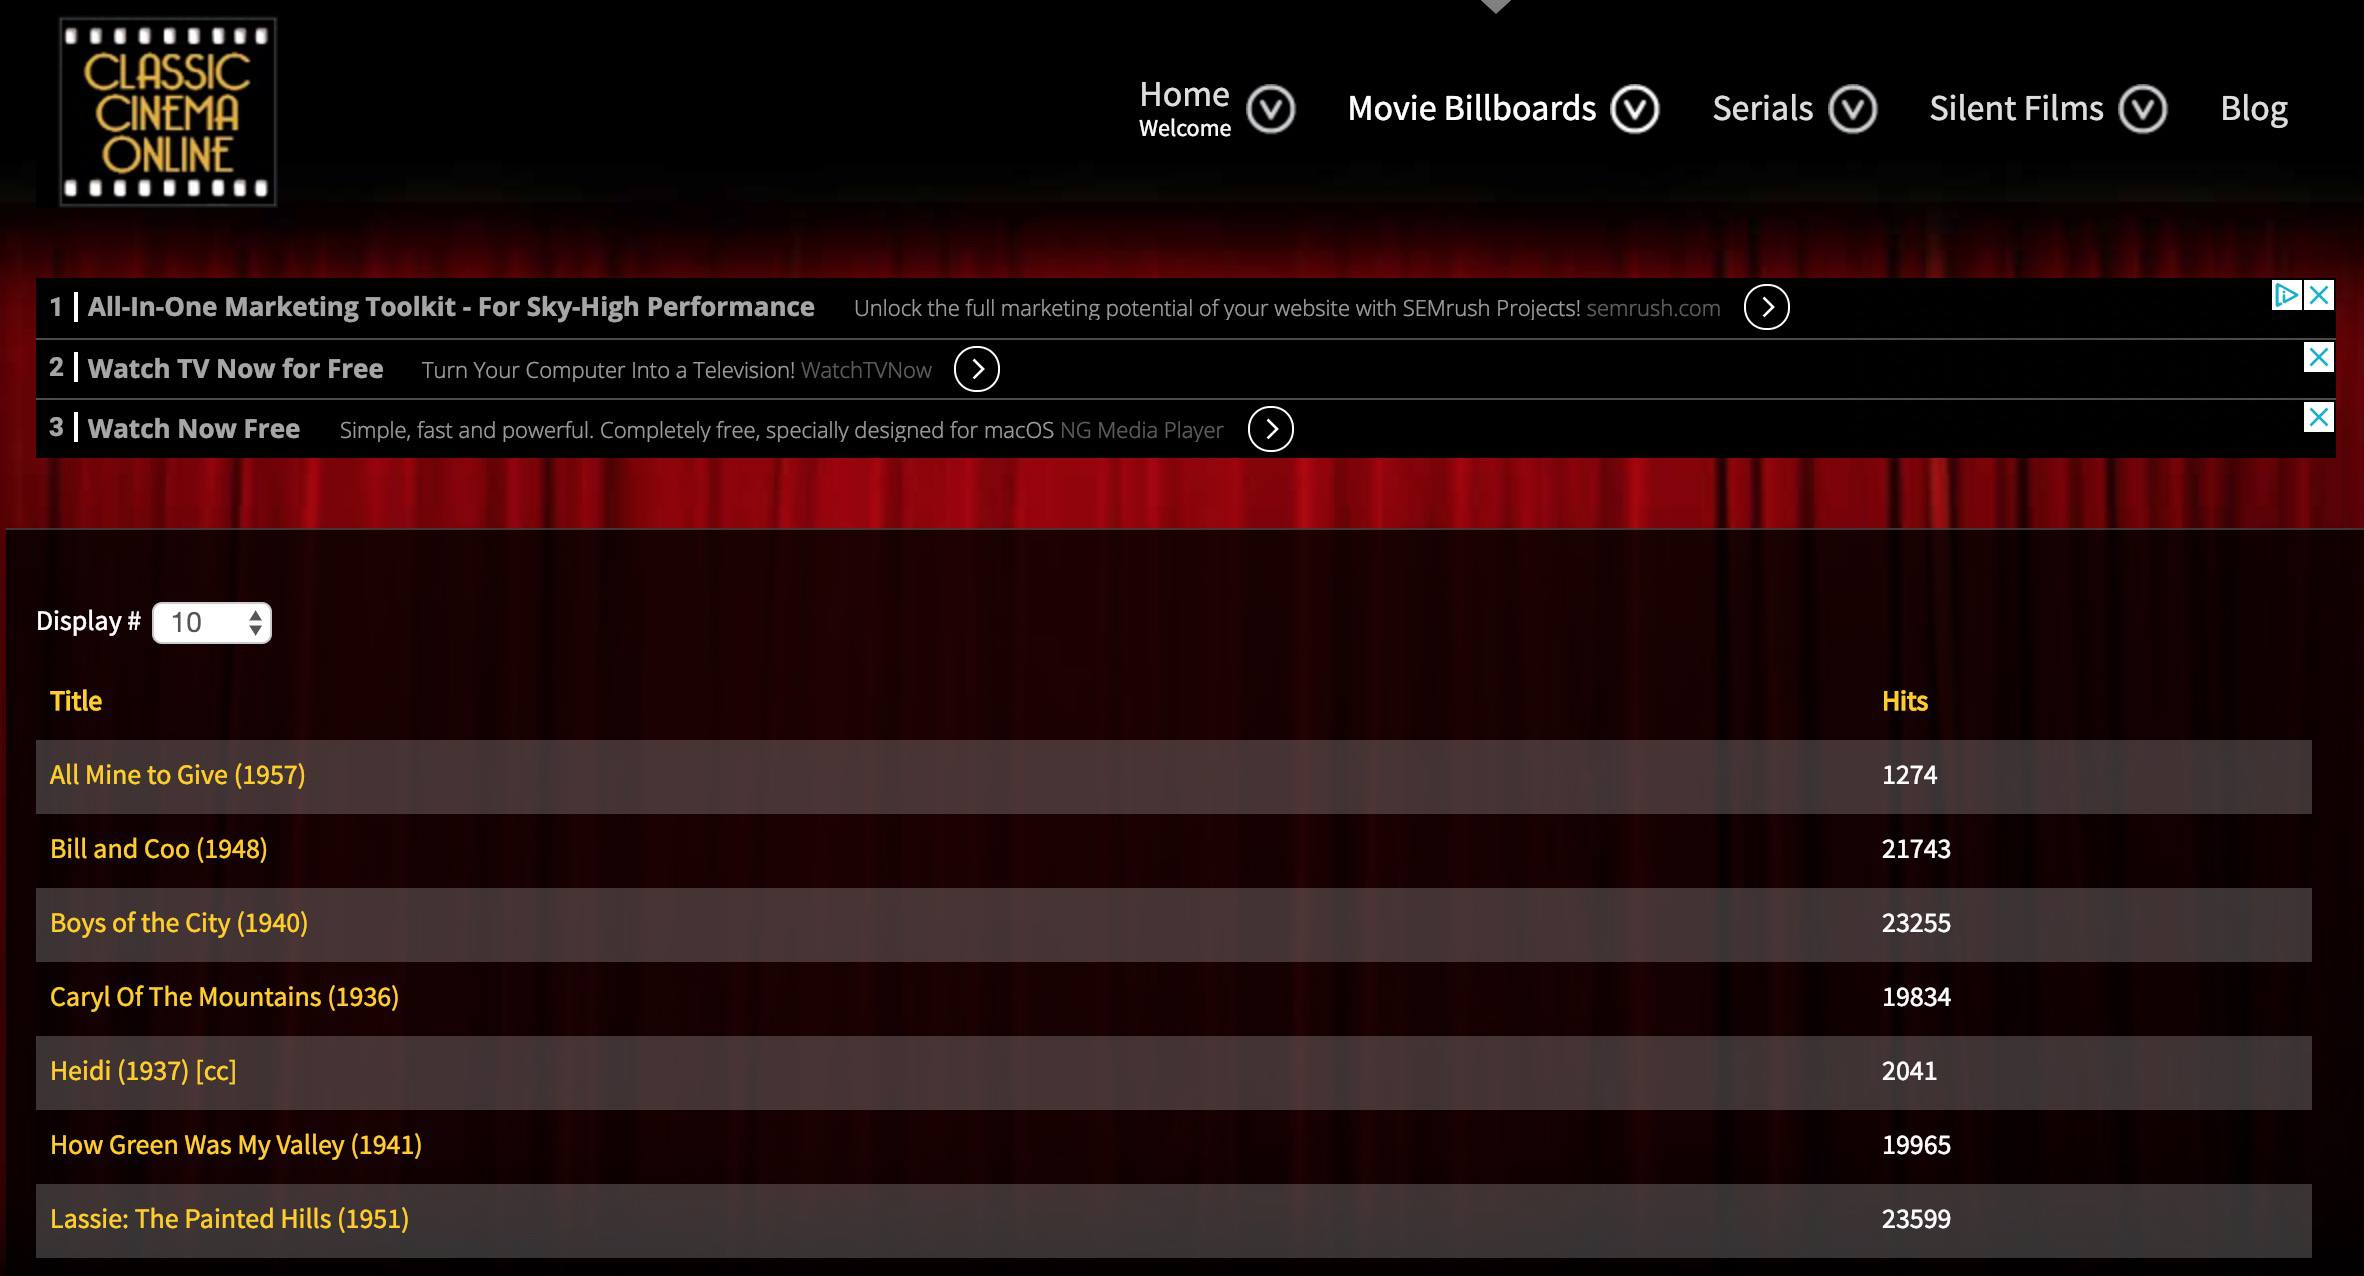 Classic Cinema Online web site